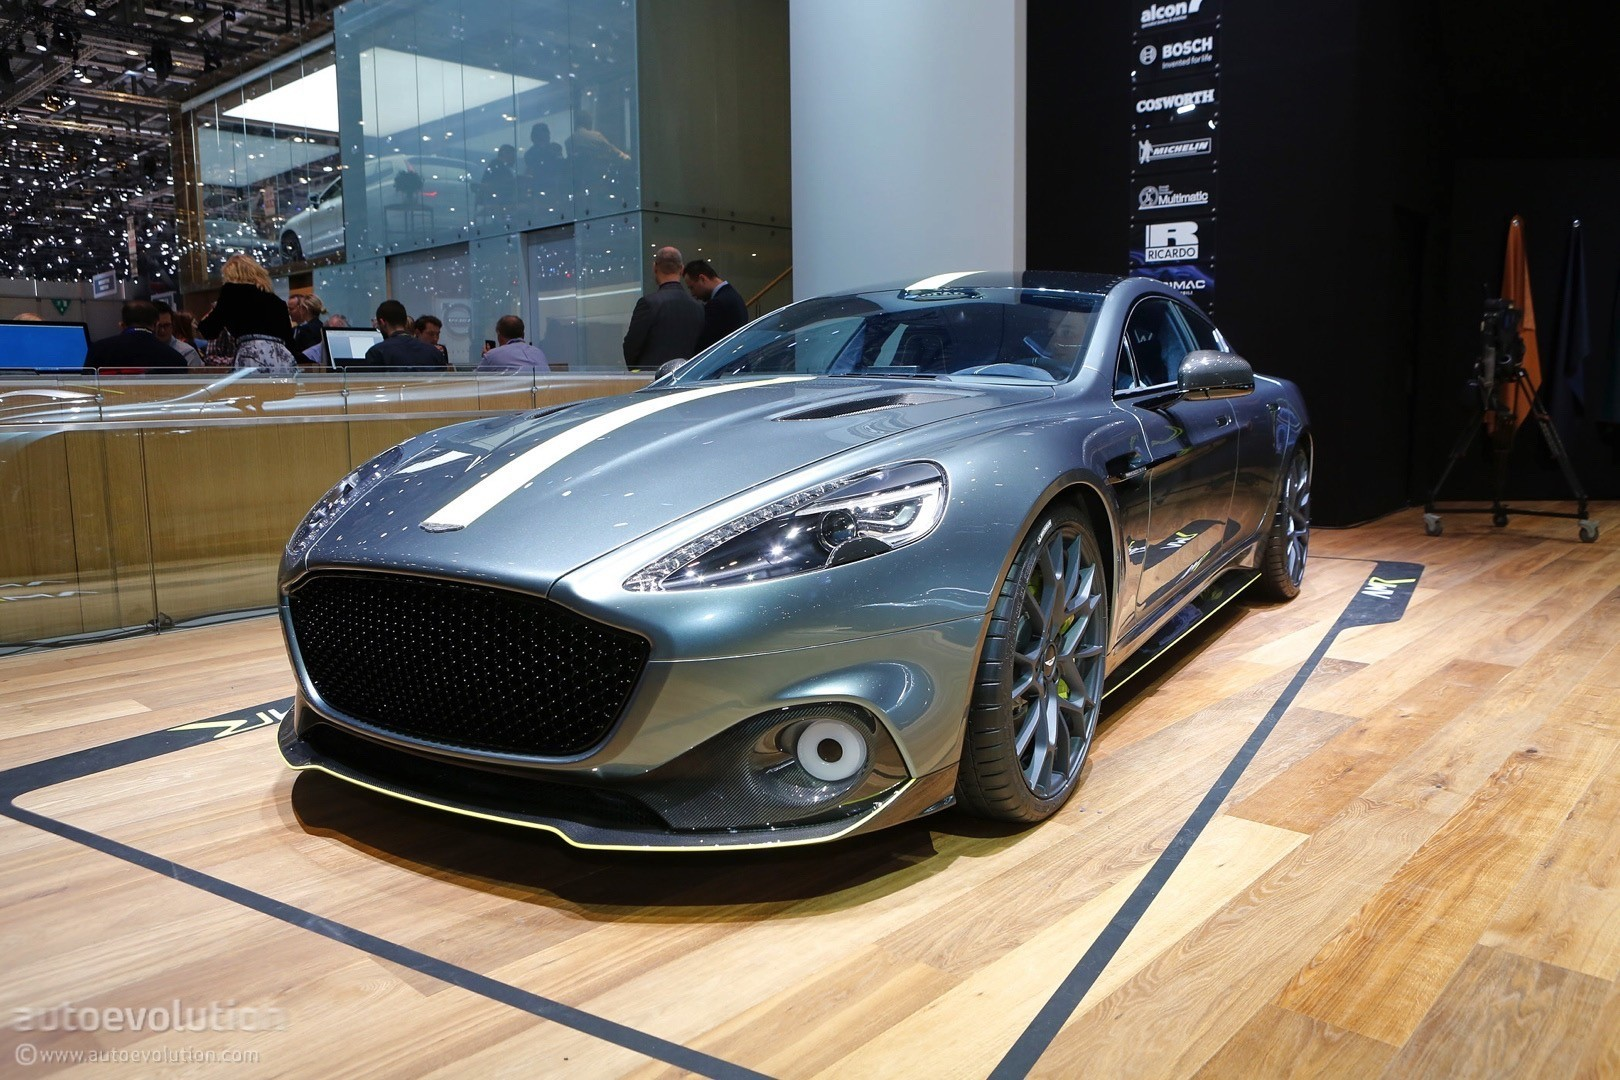 Aston Martin Vantage AMR Pro Is a Customer Racecar with an ...